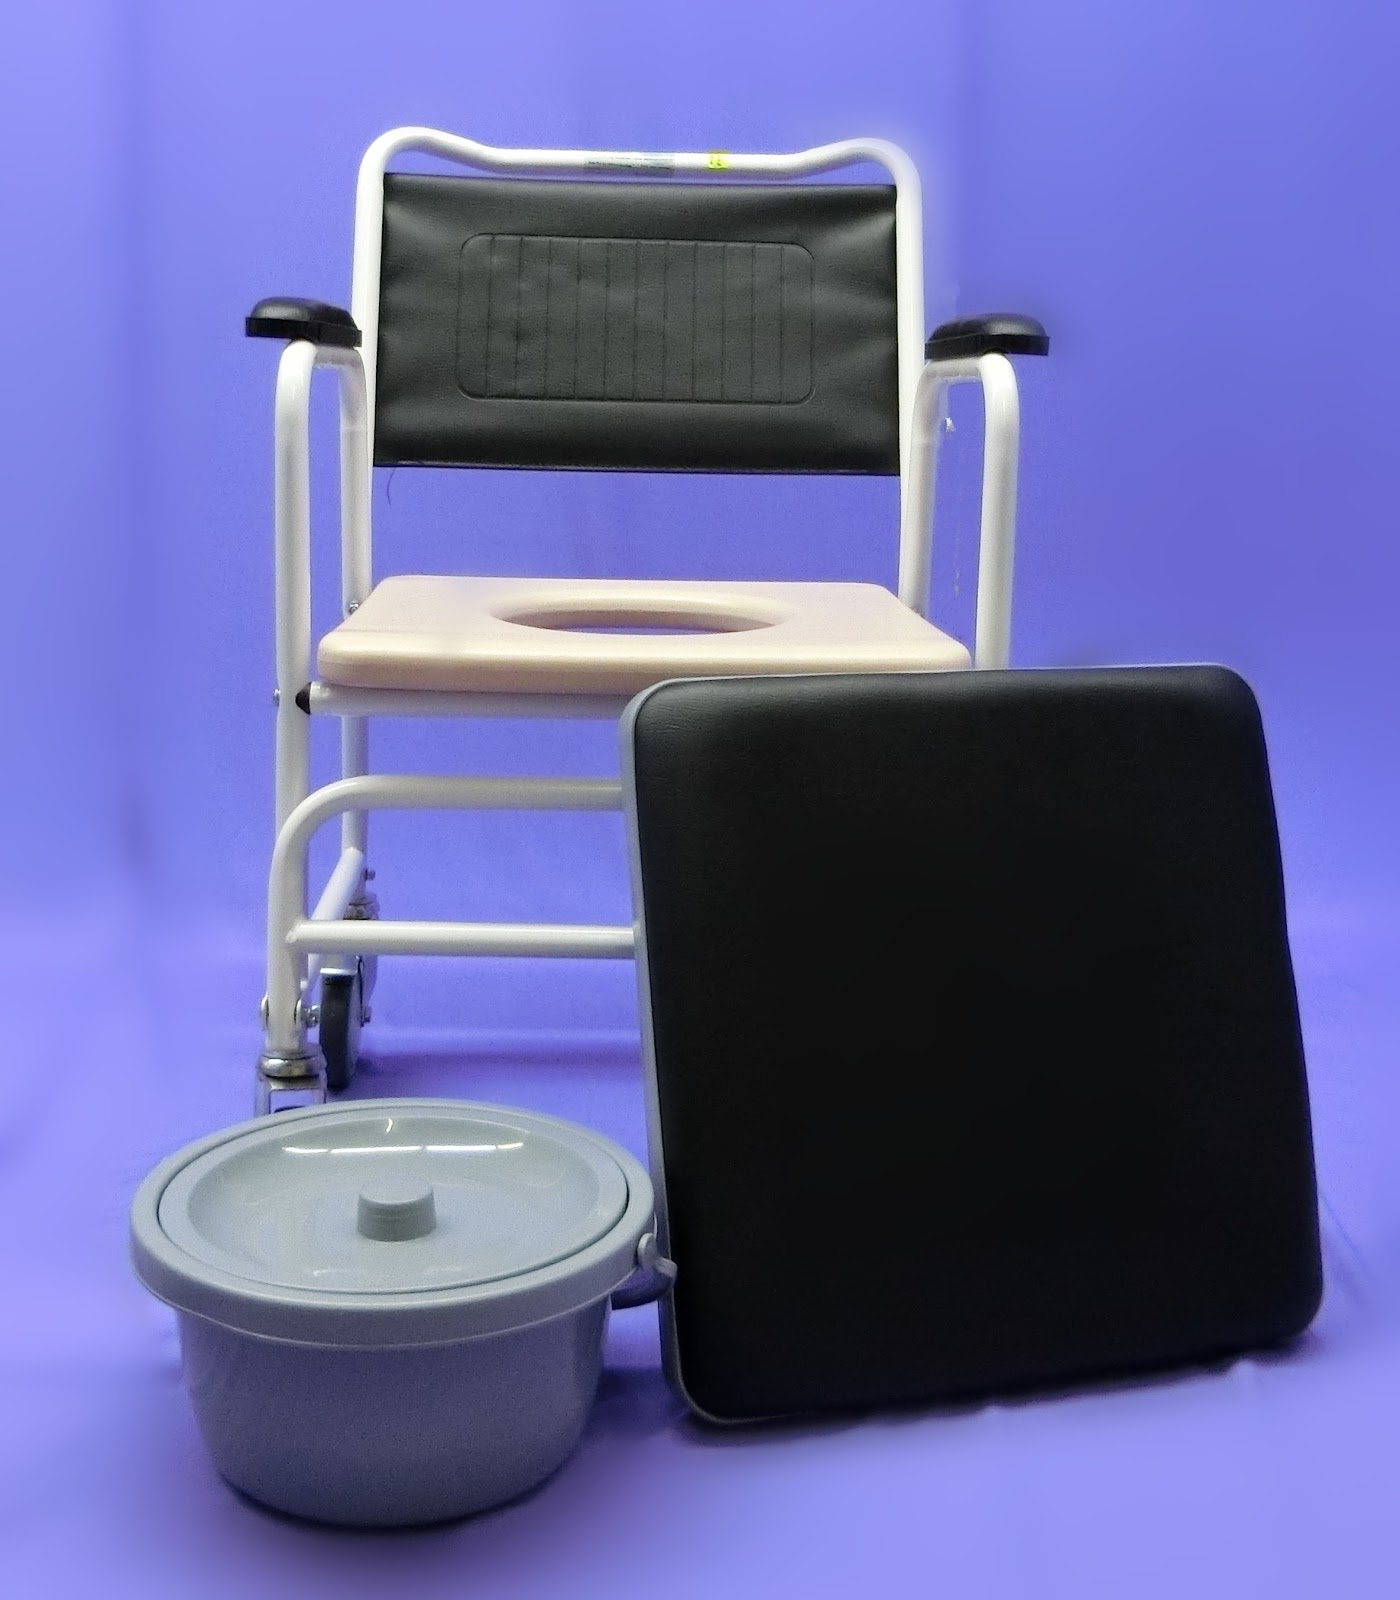 Shower Chair Malaysia Best Executive Folding Foot Holder Commode Penang Kerusi